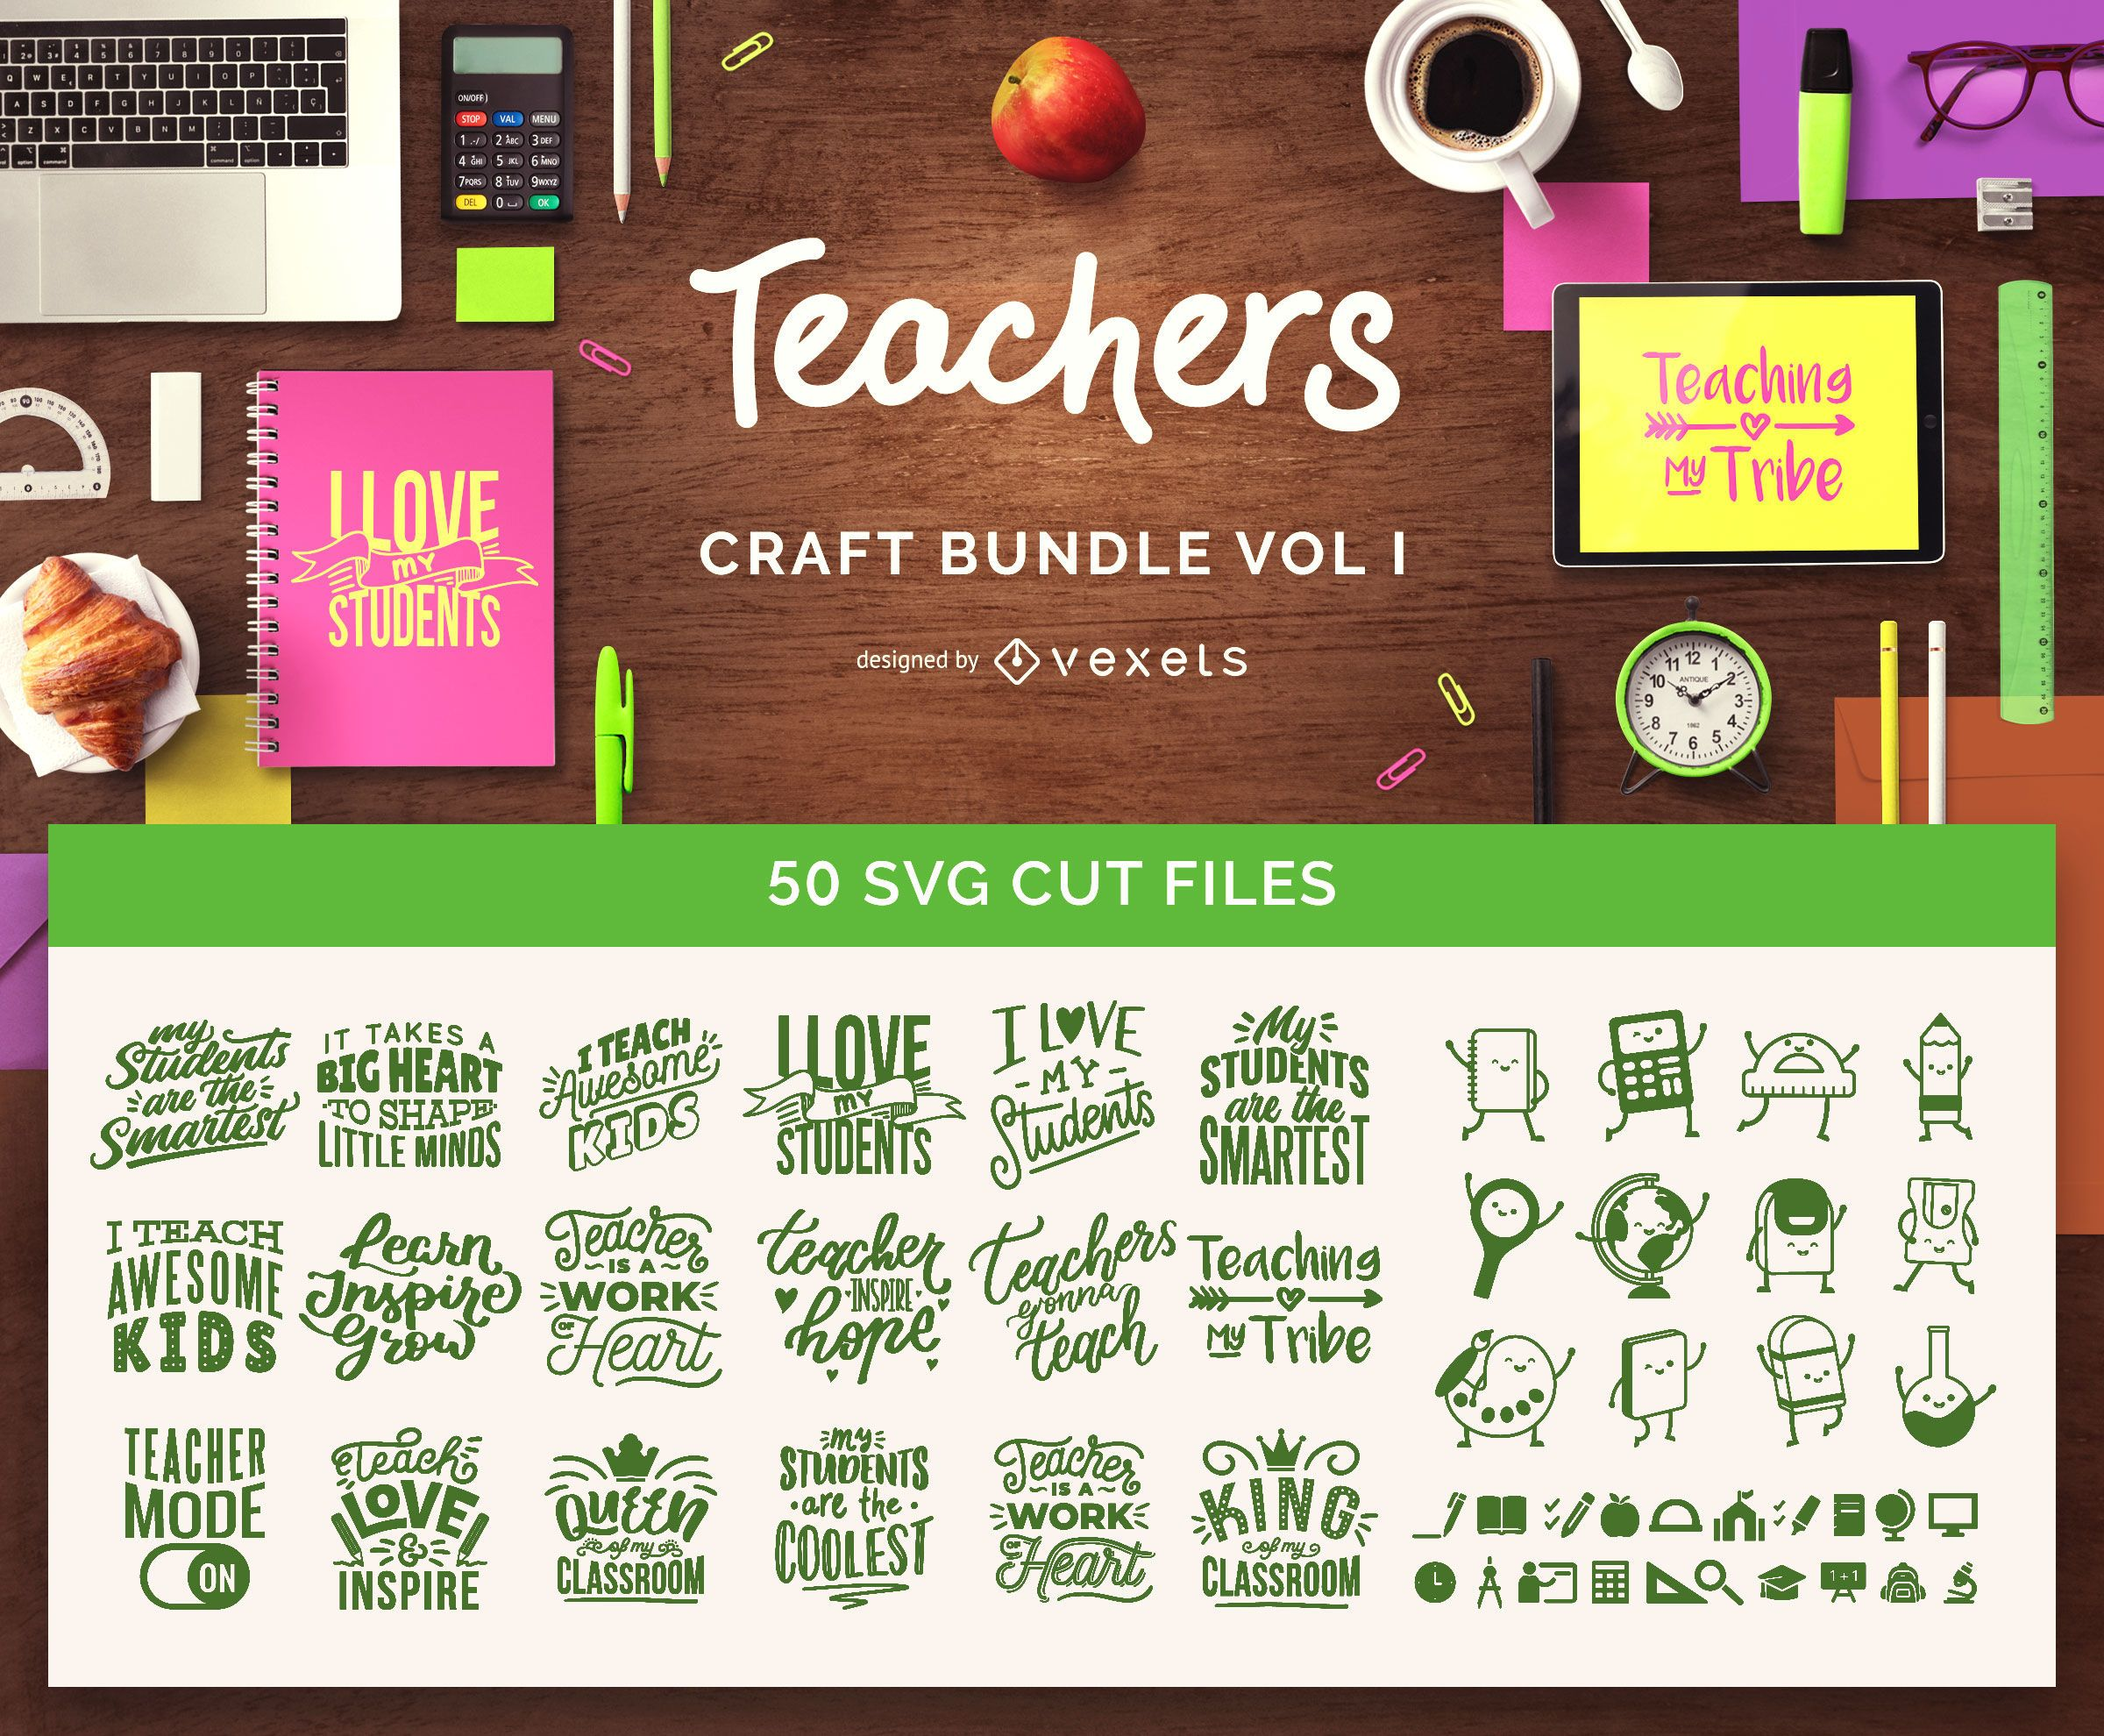 Teachers Craft Bundle Vol I